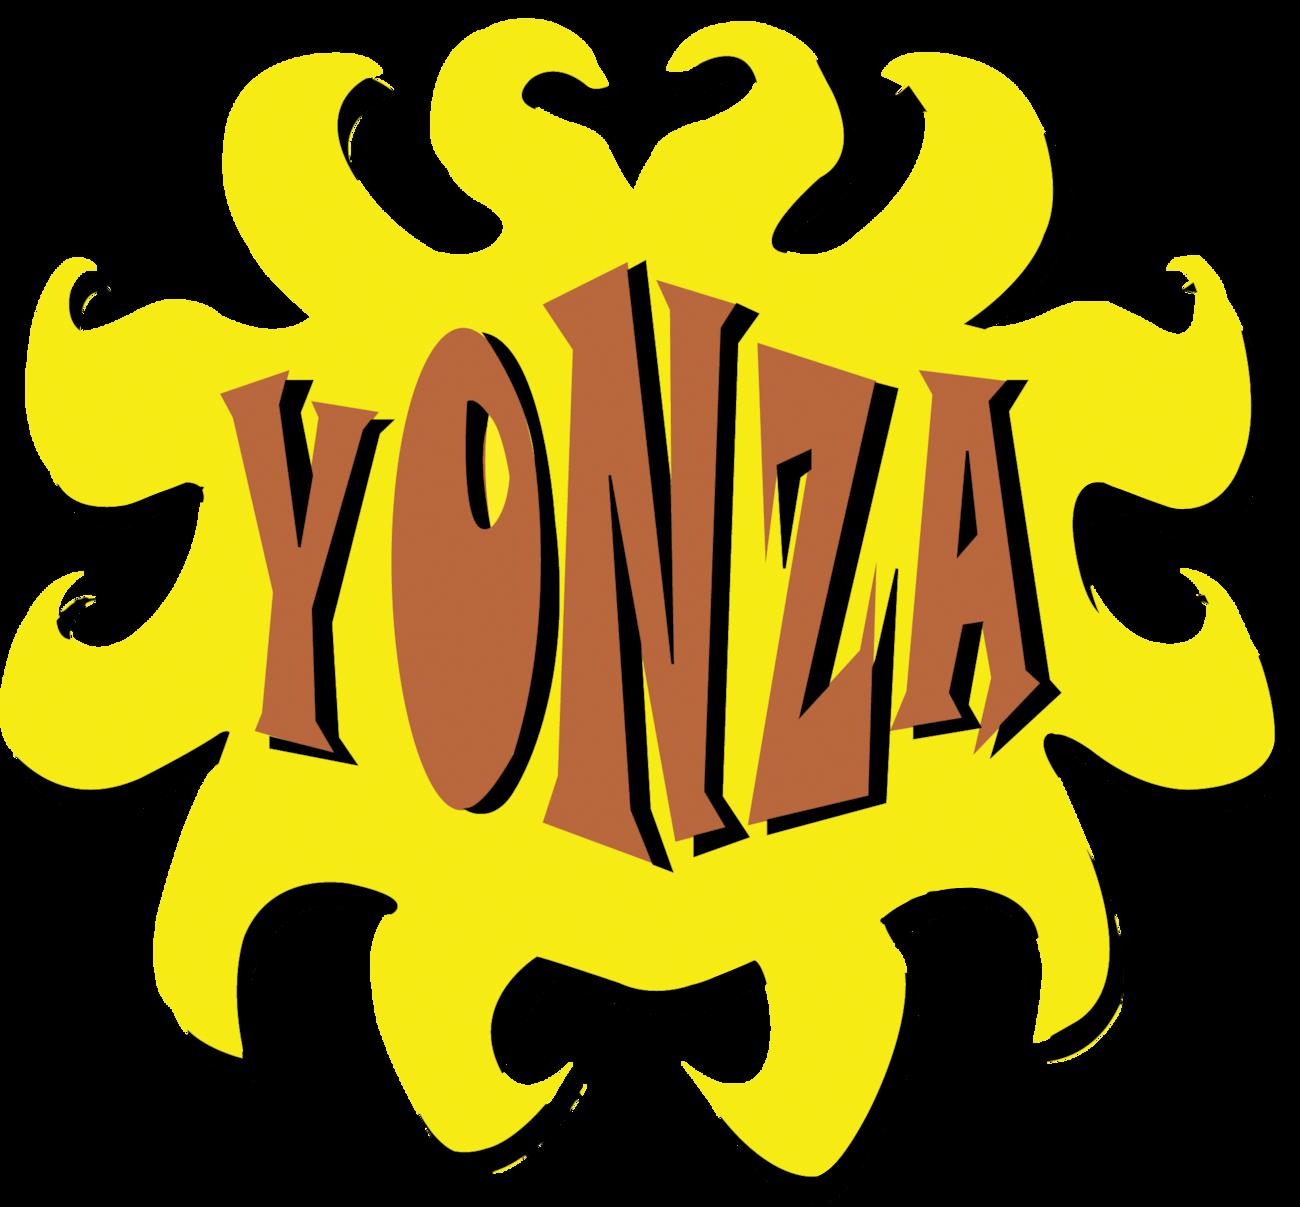 Yonza Crepes